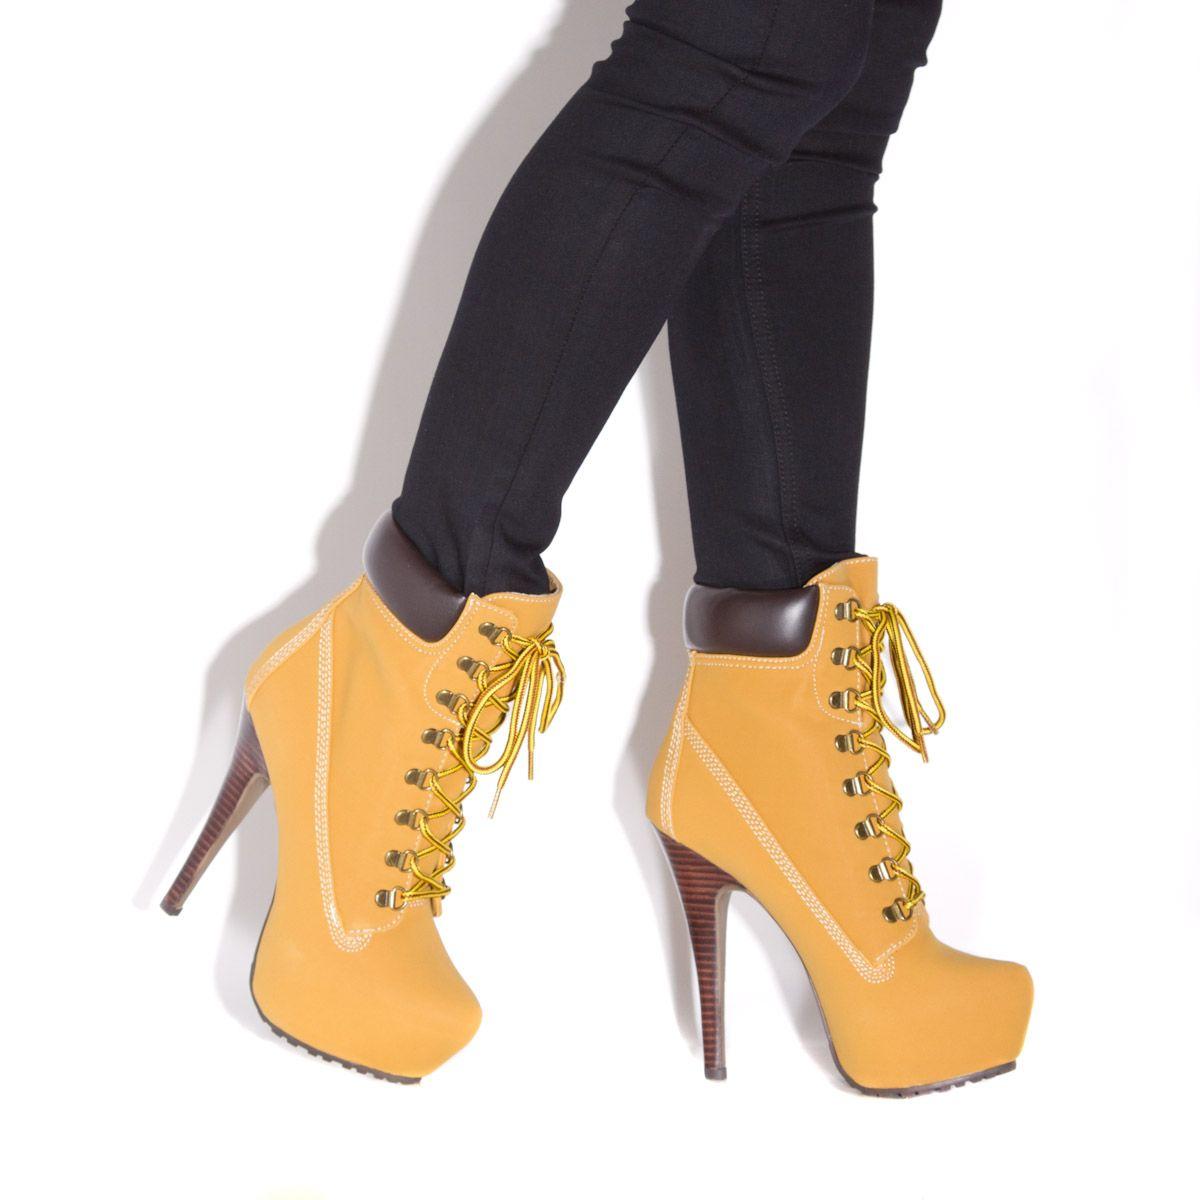 GorgeousTimberland Love Stylelt;3 The Feet BootsDressing My tQCrdhsx